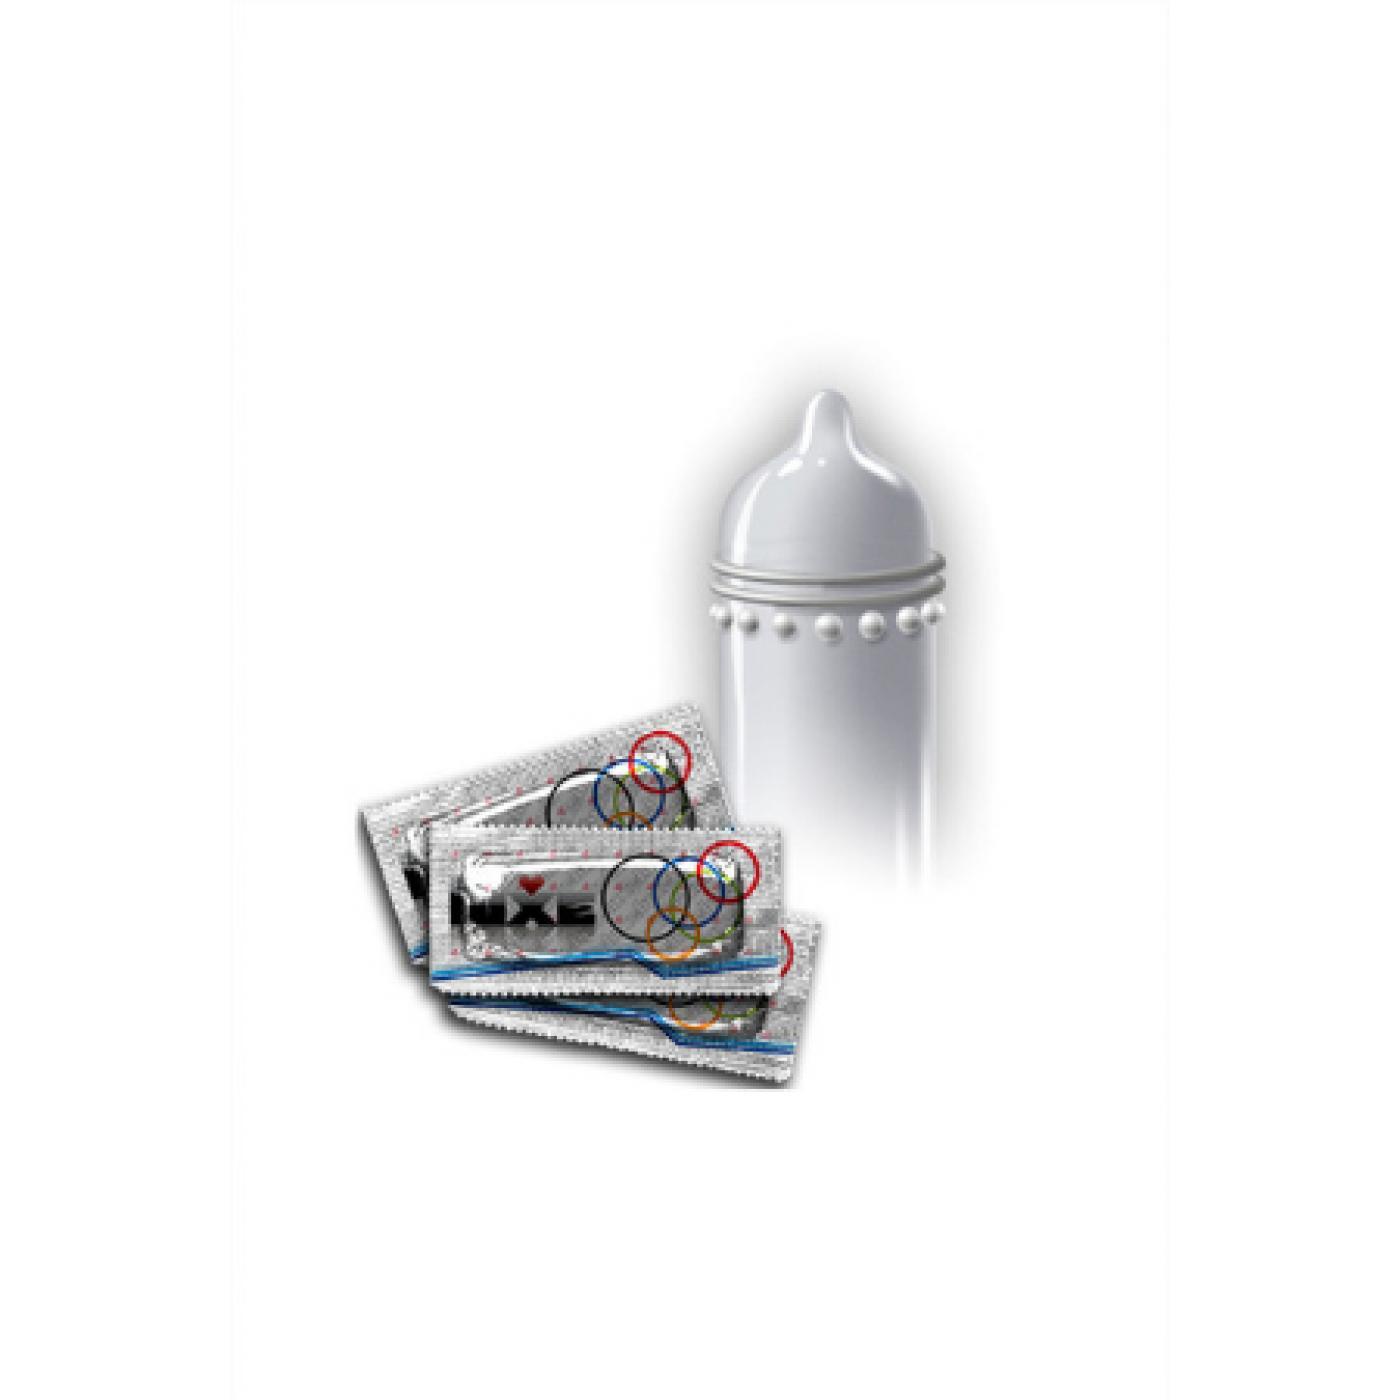 Презервативы LUXE постельное двоеборье 3 шт